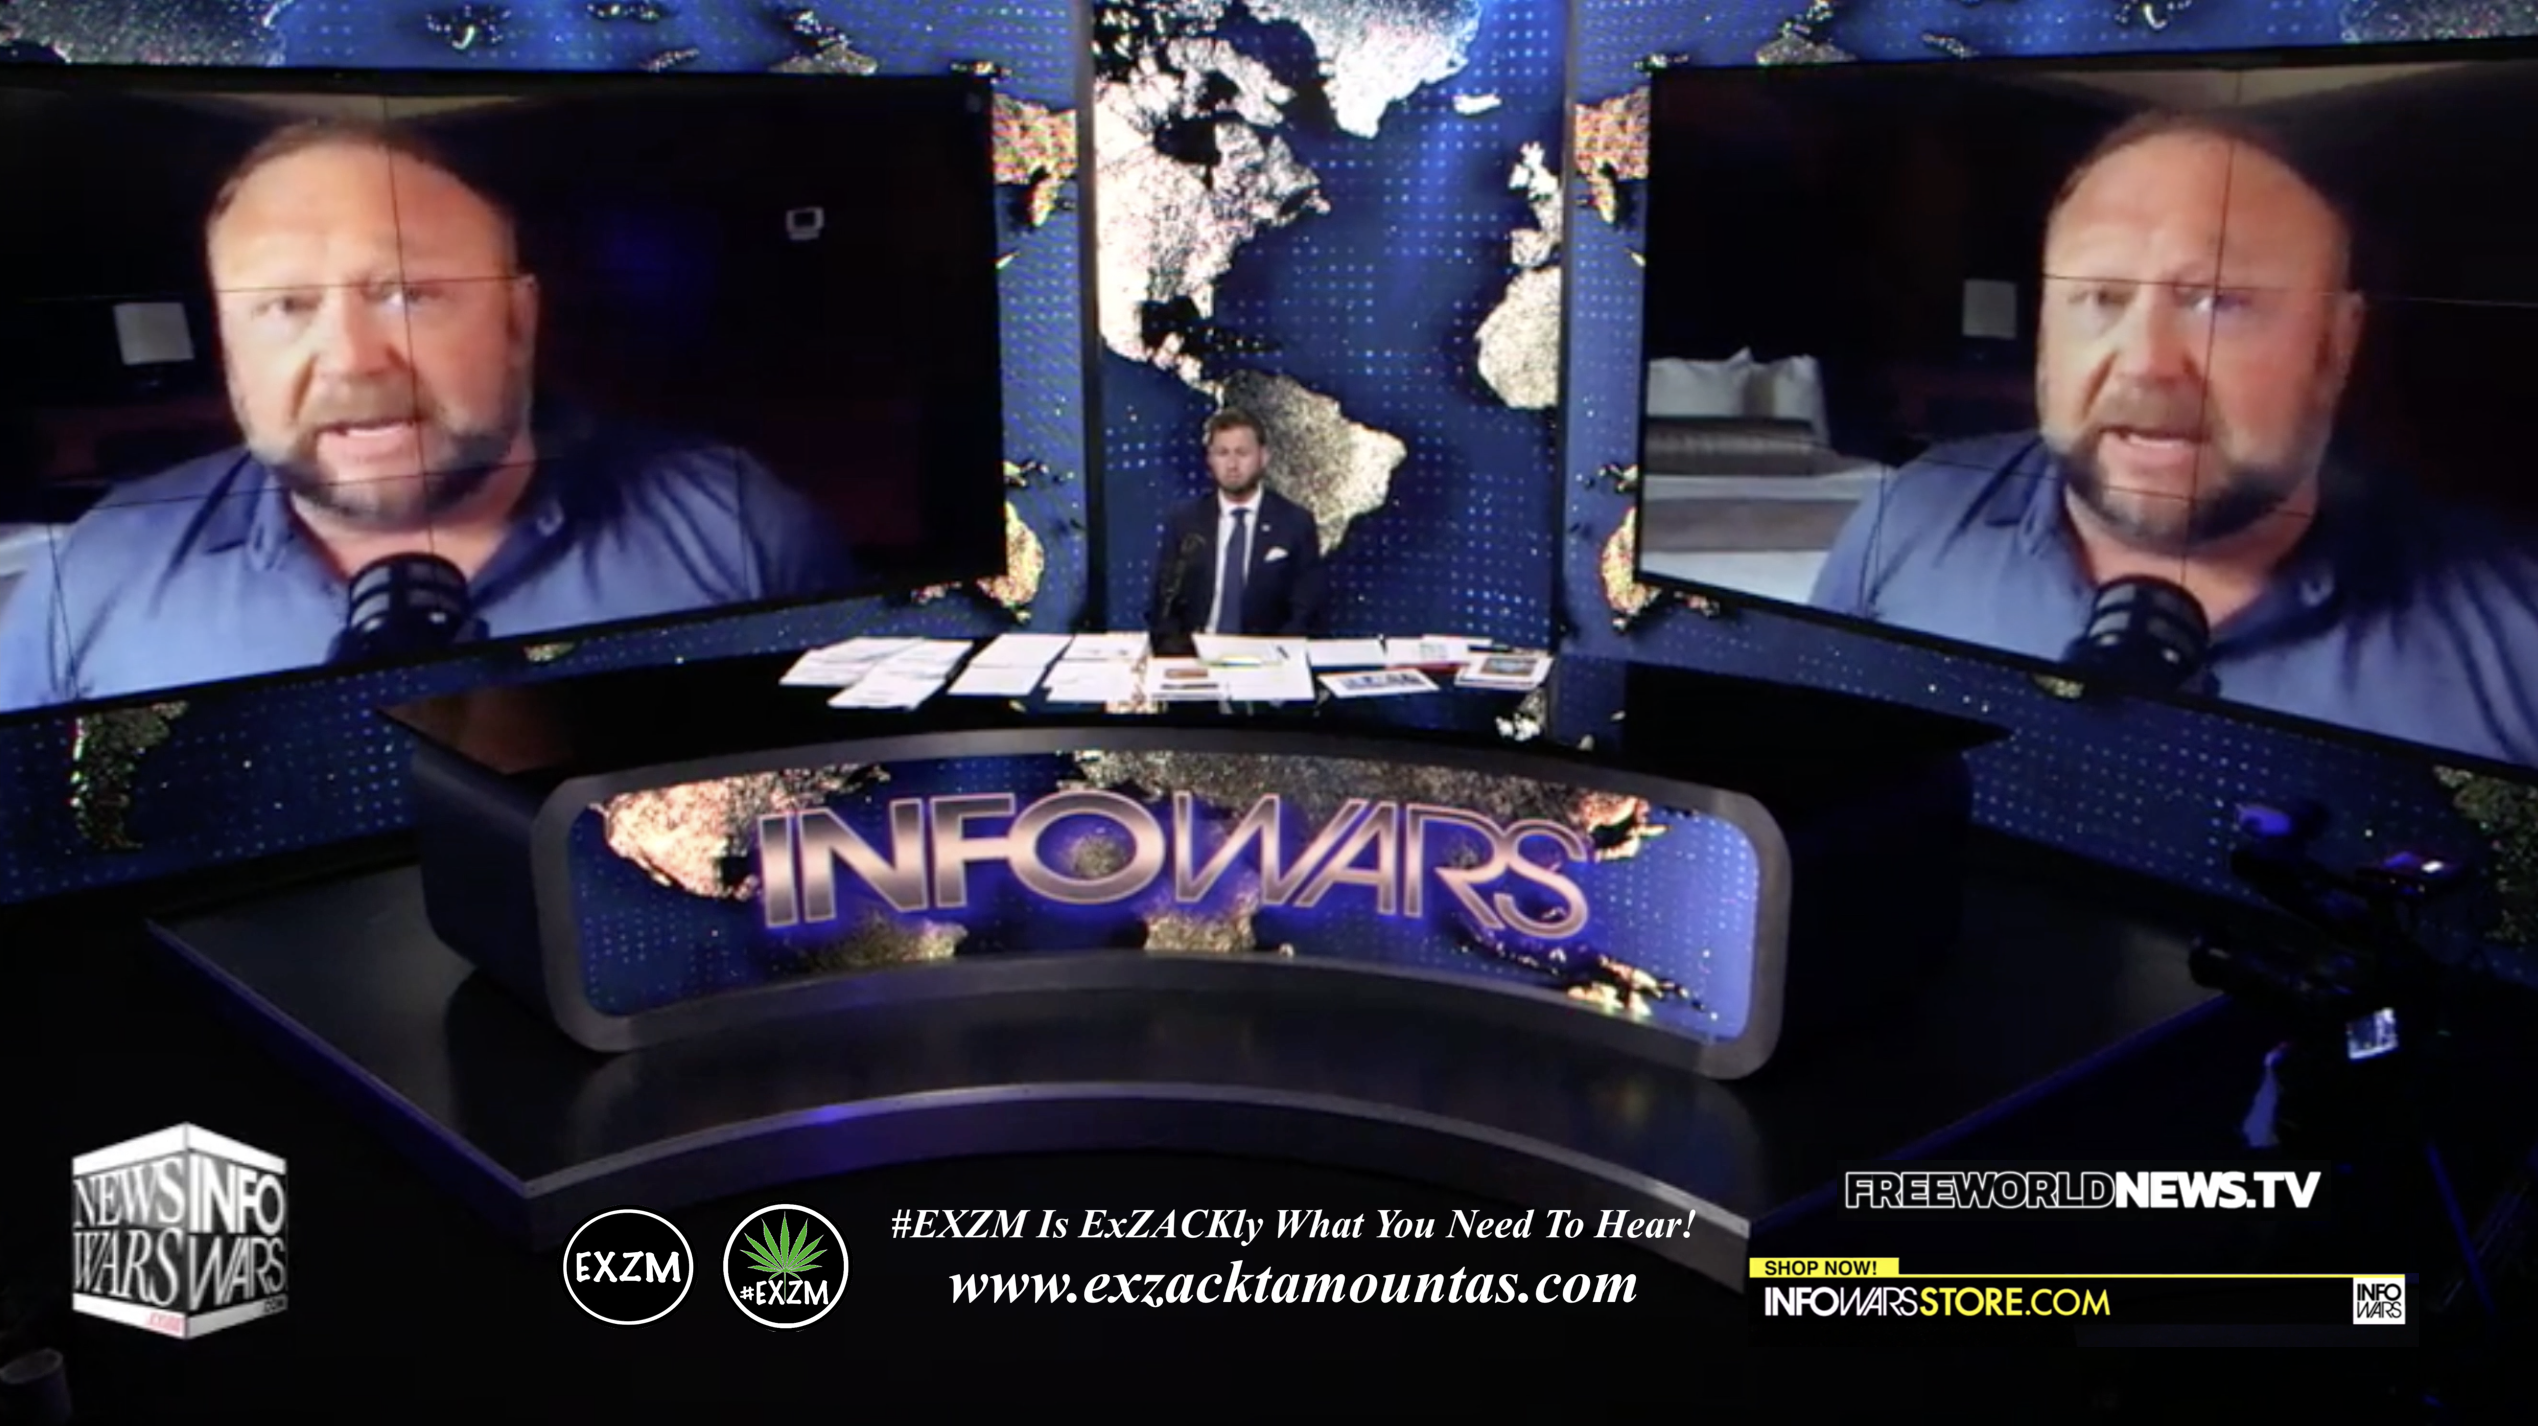 Alex Jones Owen Shroyer Live In Infowars Studio Free World News TV EXZM Zack Mount July 27th 2021 copy